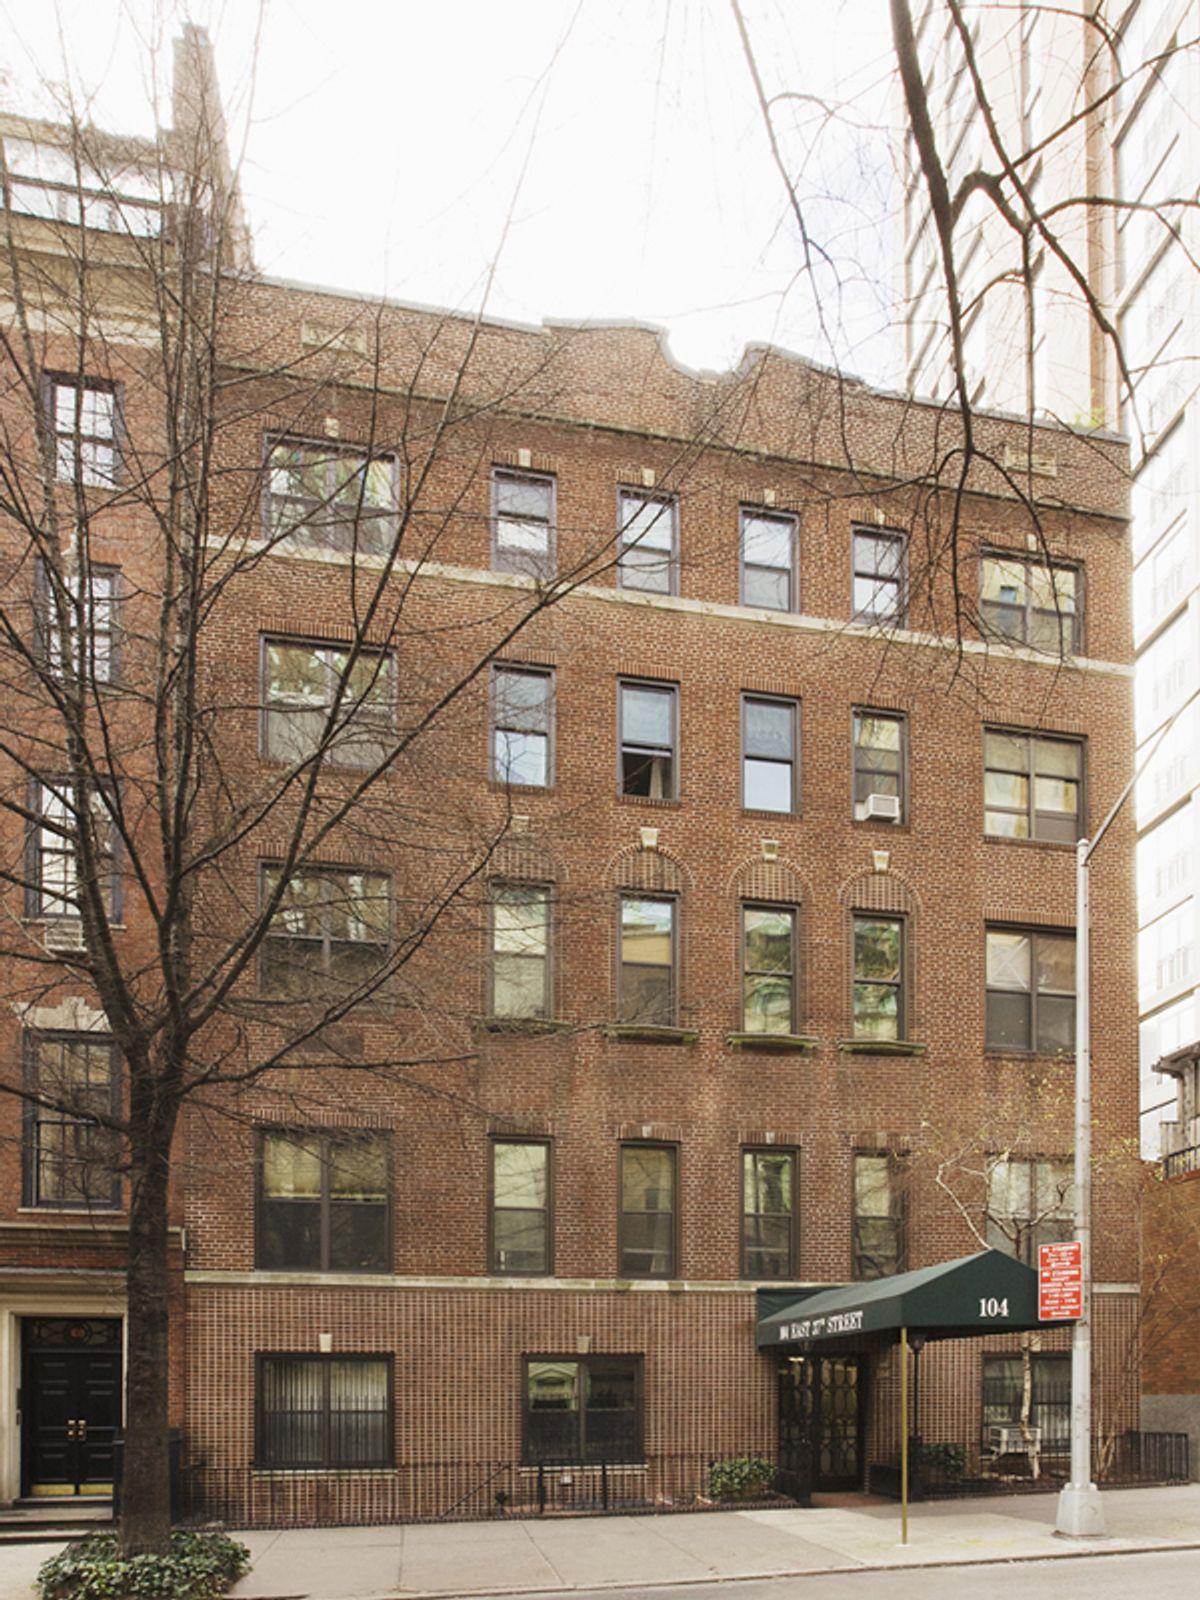 104 East 37th Street